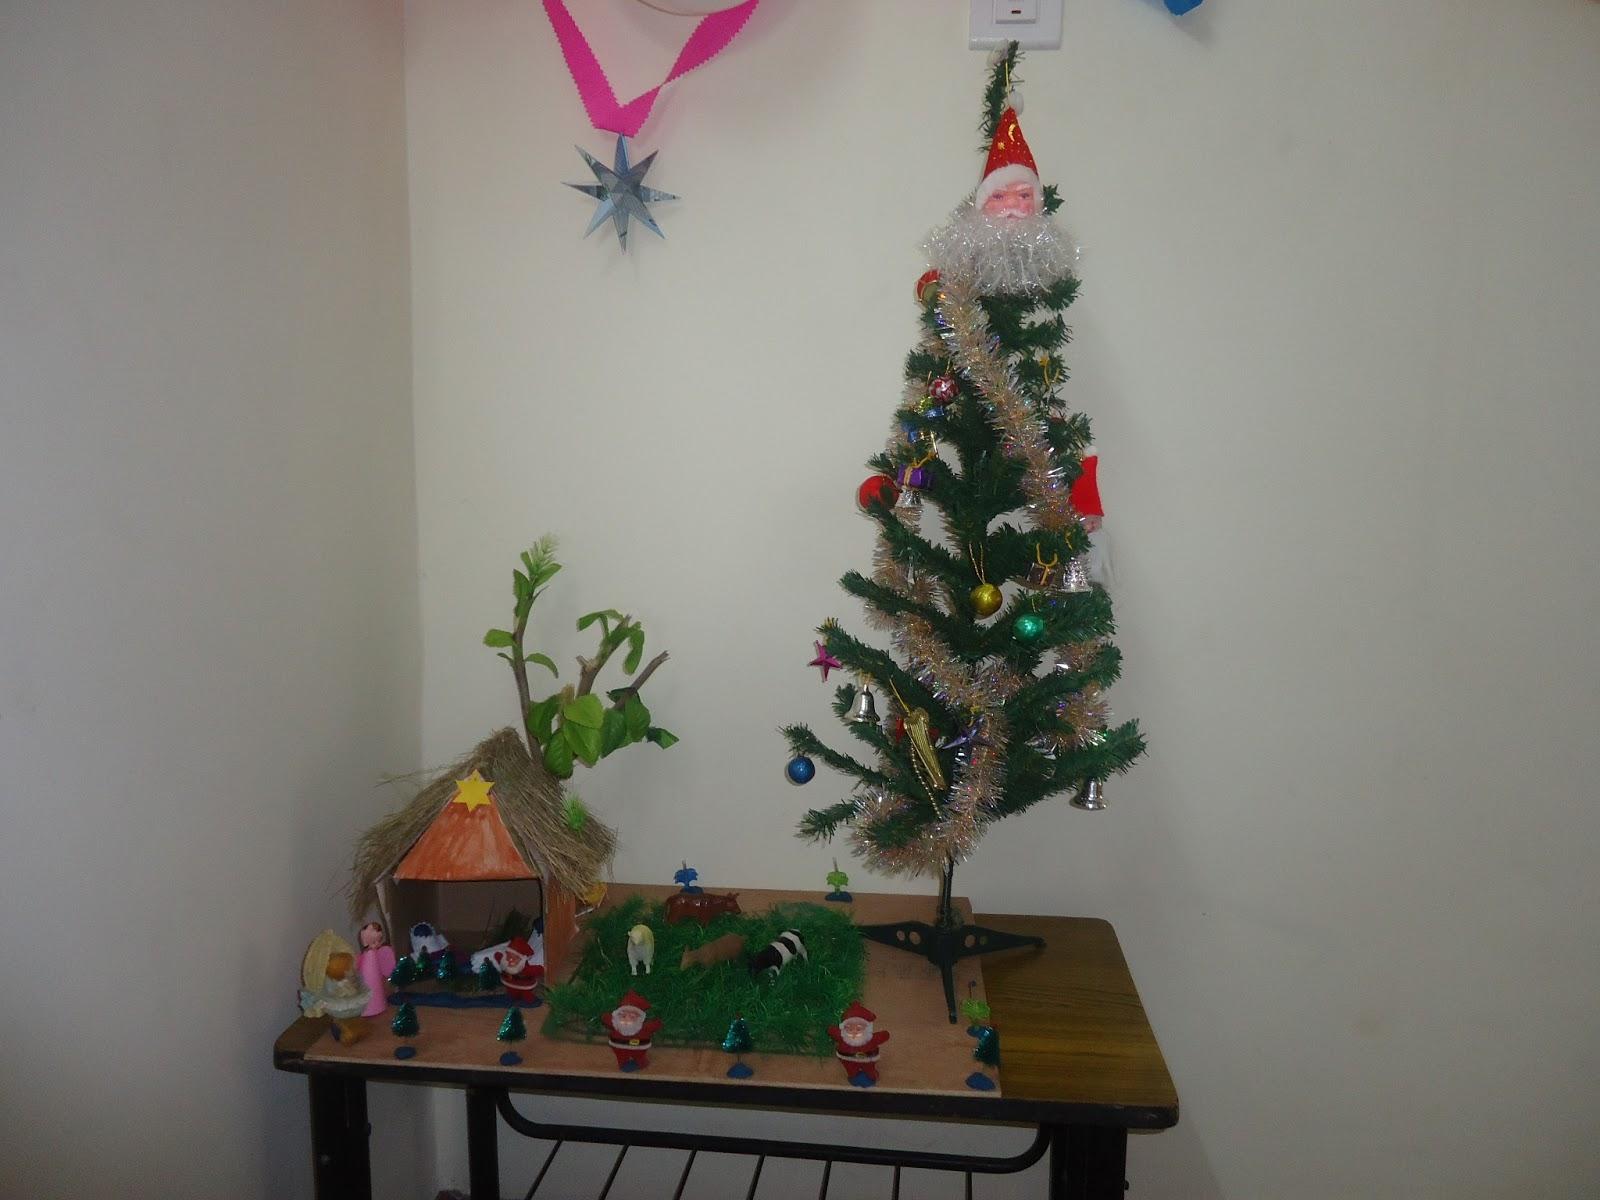 Ilanthalir - Play school: Christmas Celebration